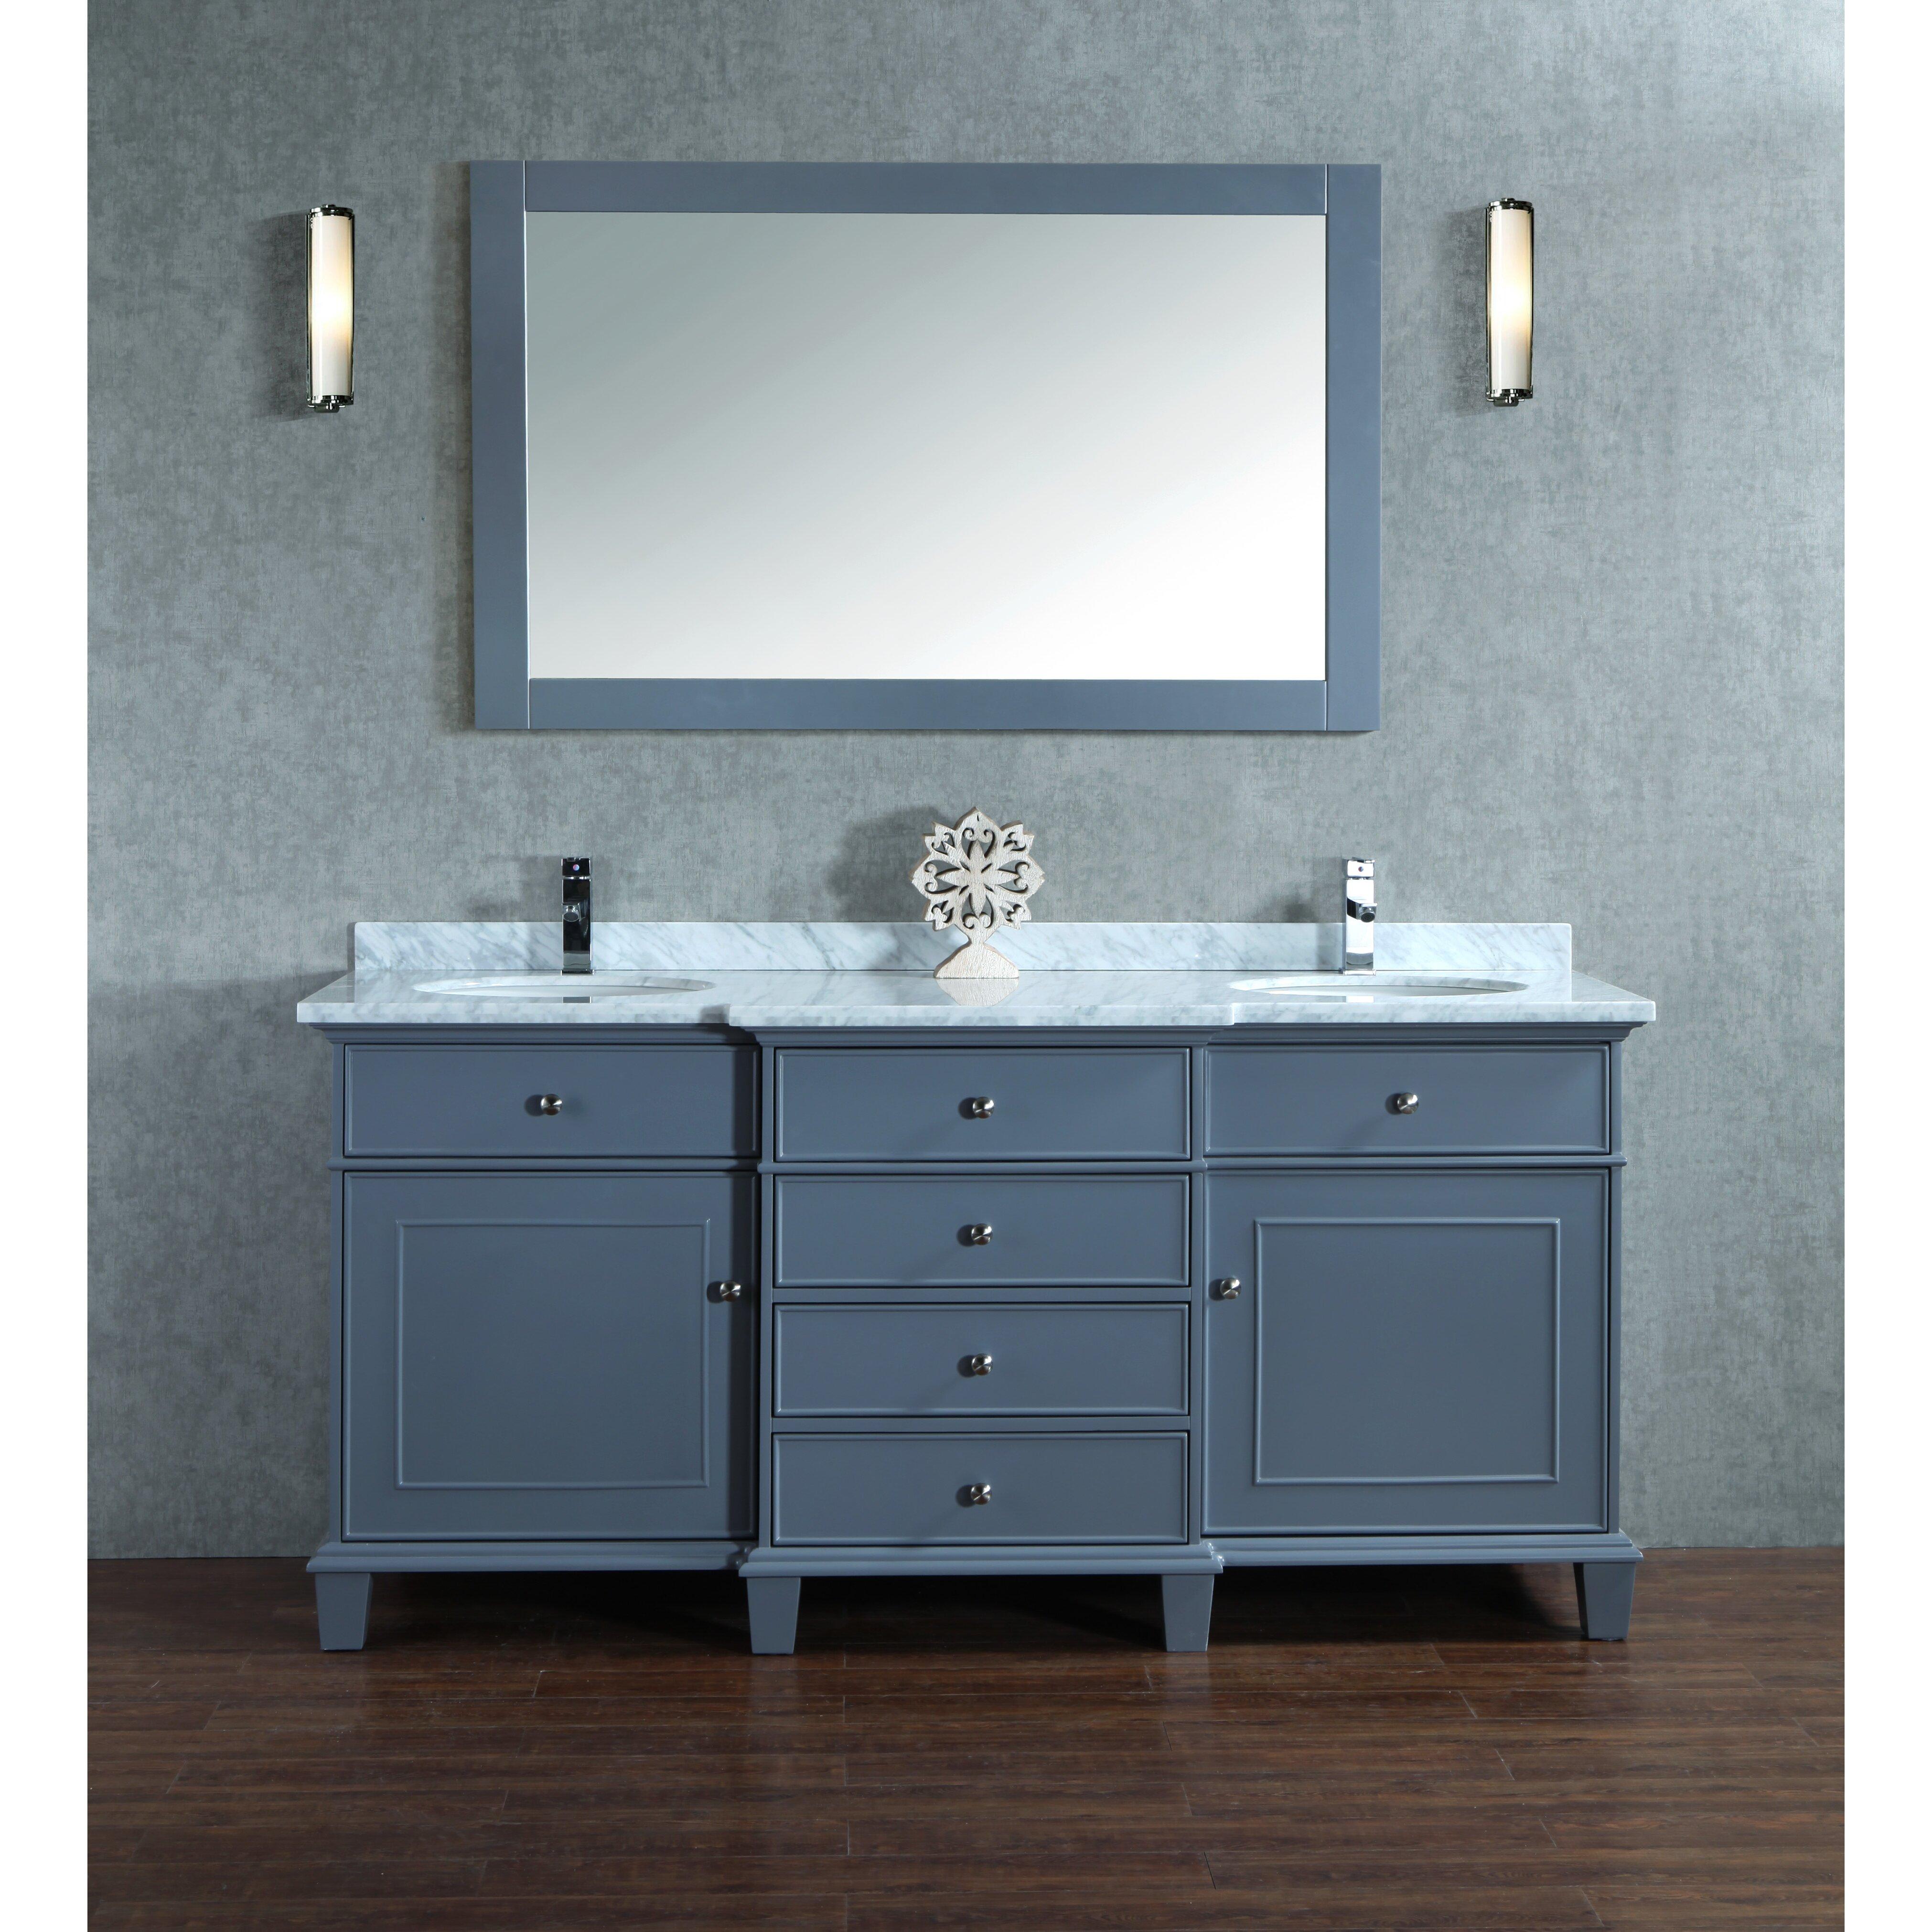 melton quot double sink bathroom vanity set with mirror: 55 inch double sink bathroom vanity